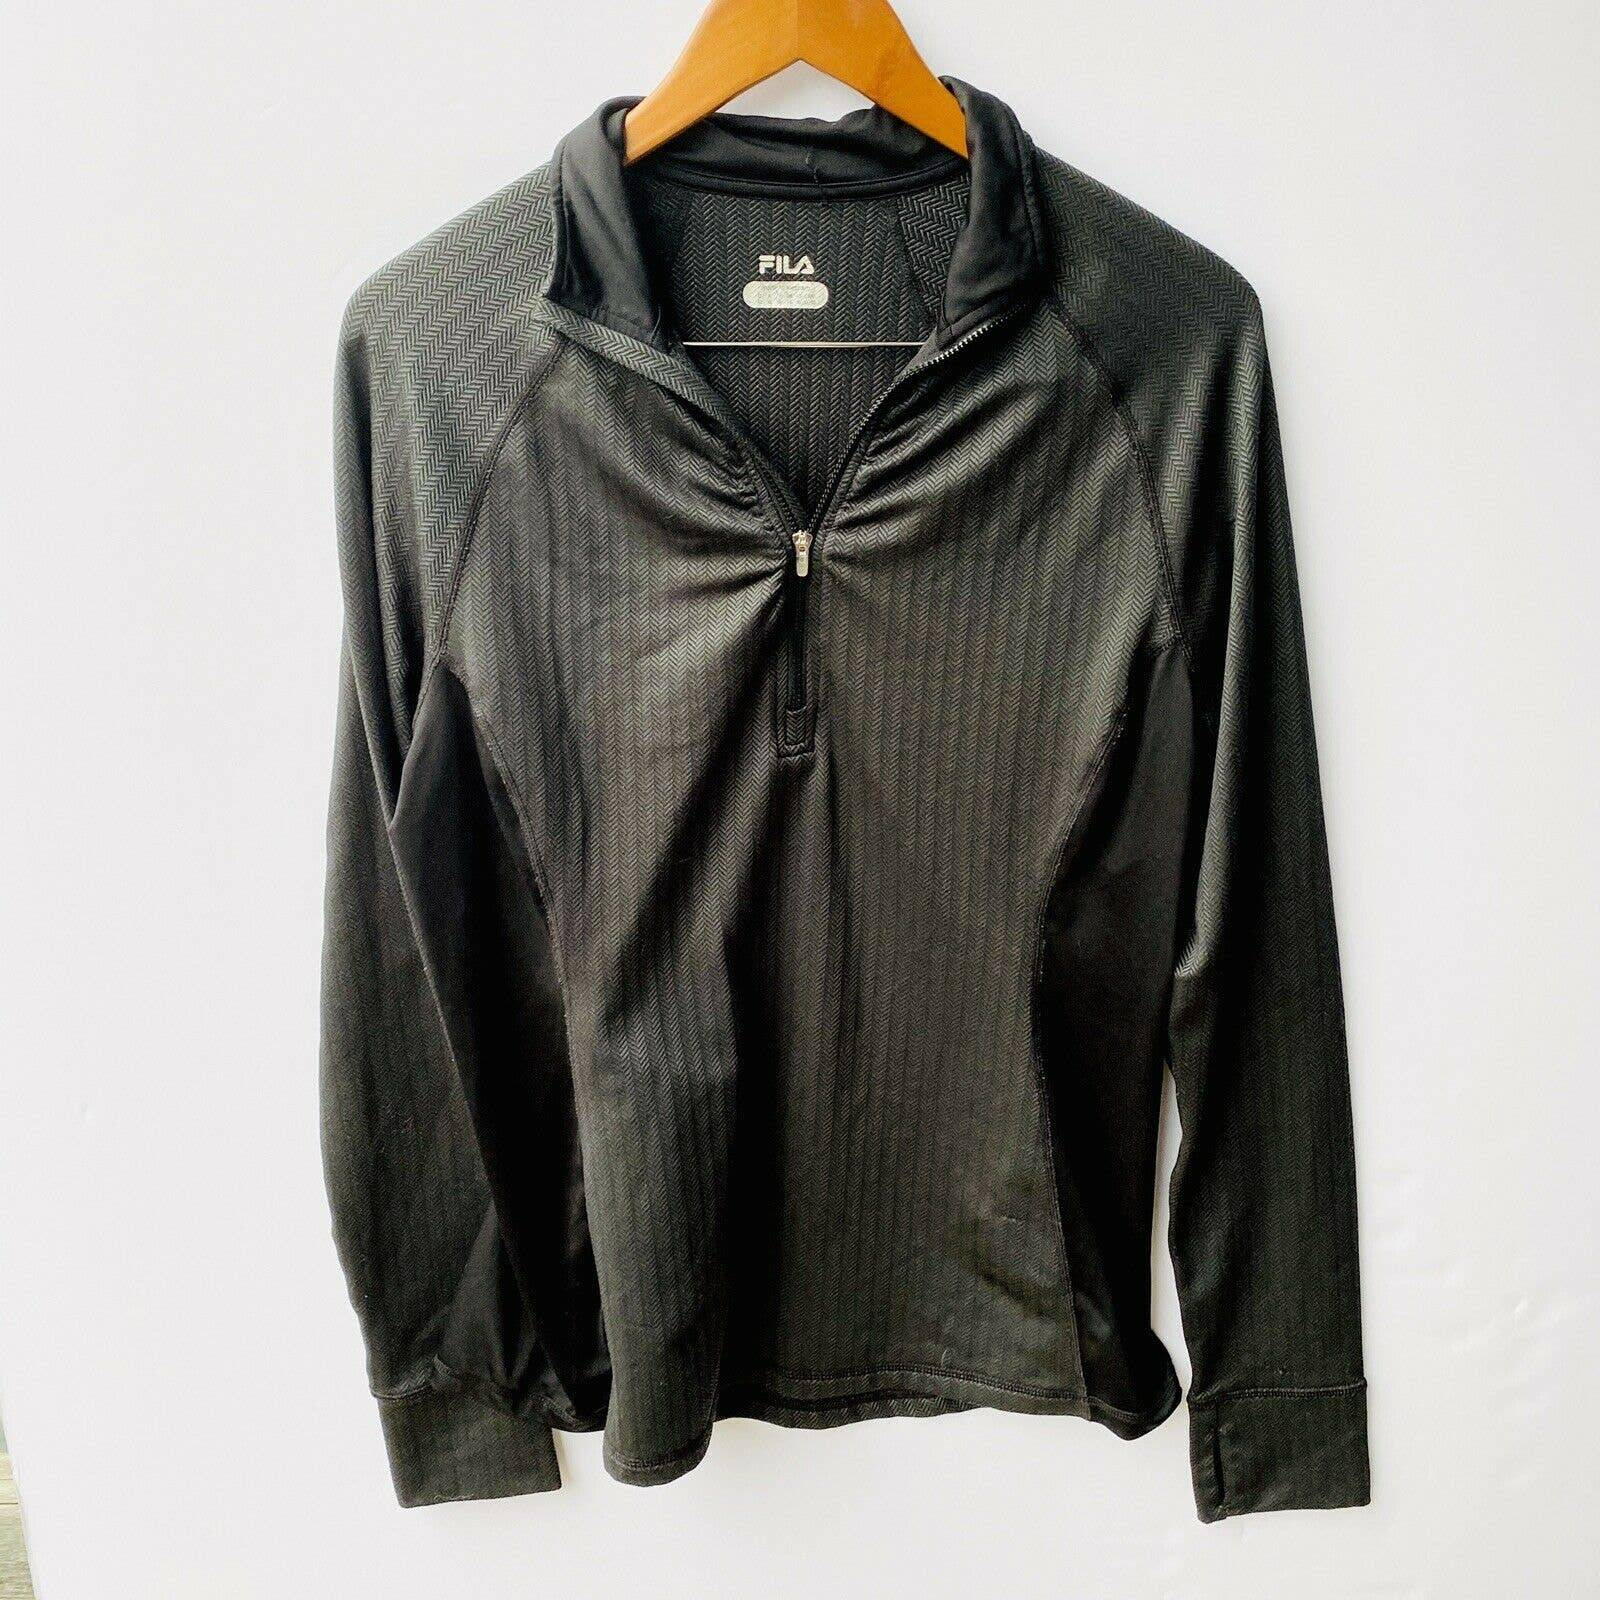 Fila Quarter Zip Pullover Jacket BlackXL